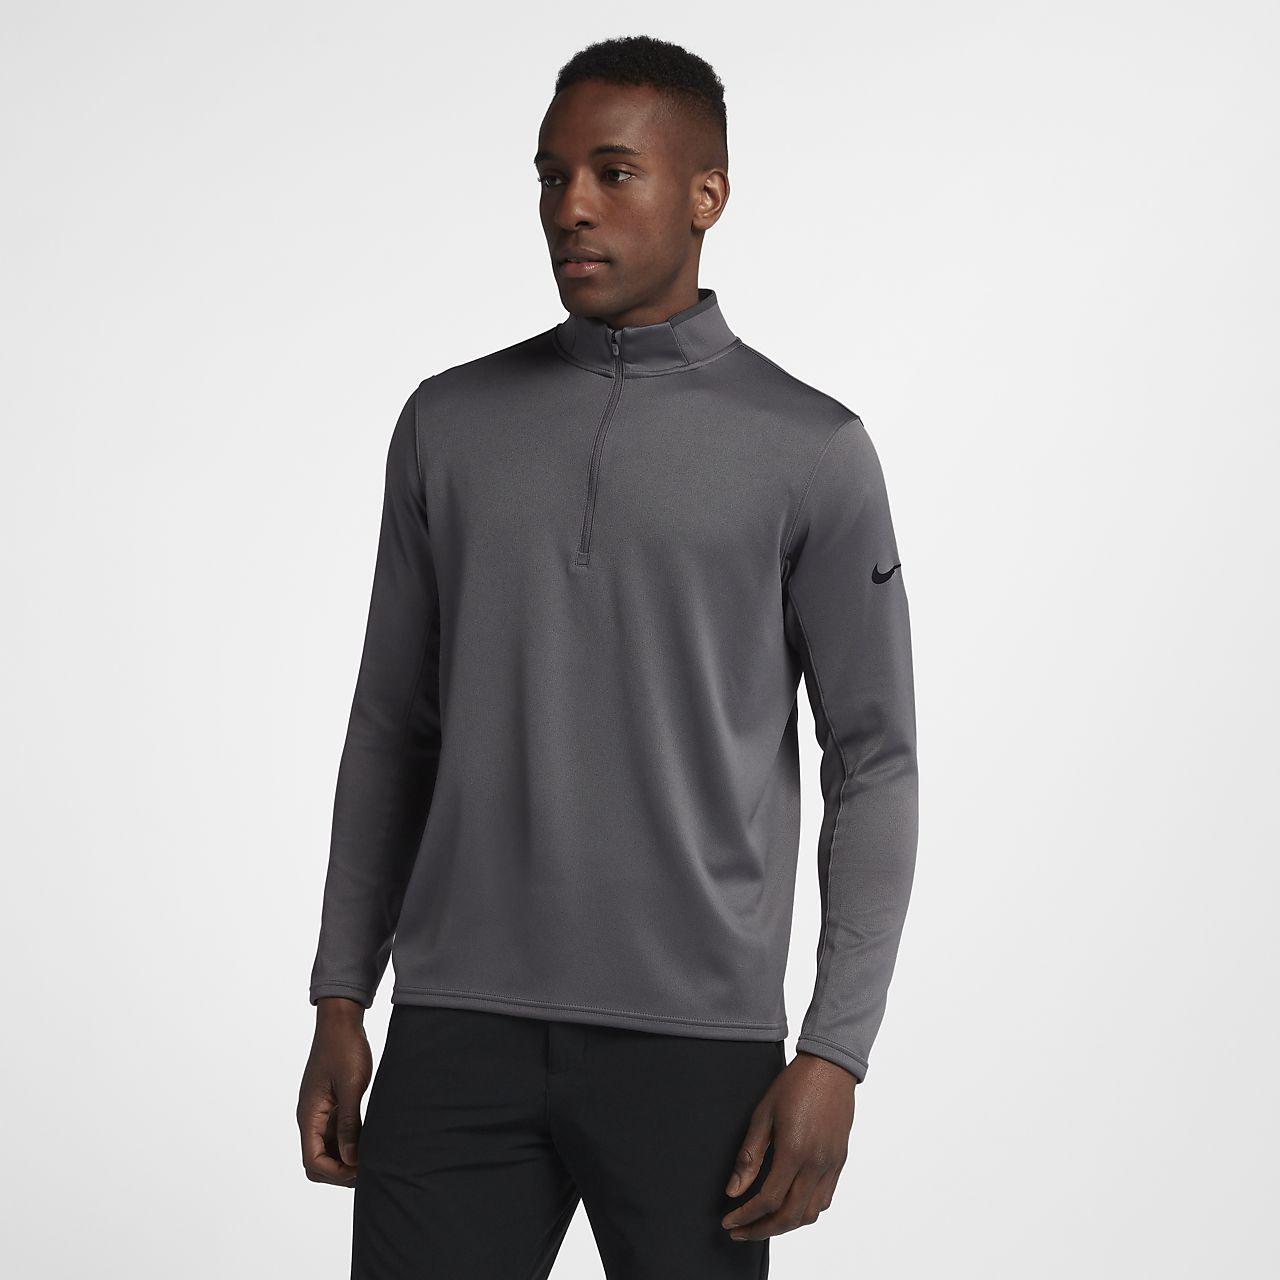 Nike Dri-FIT Half-Zip langermet golfoverdel for herre